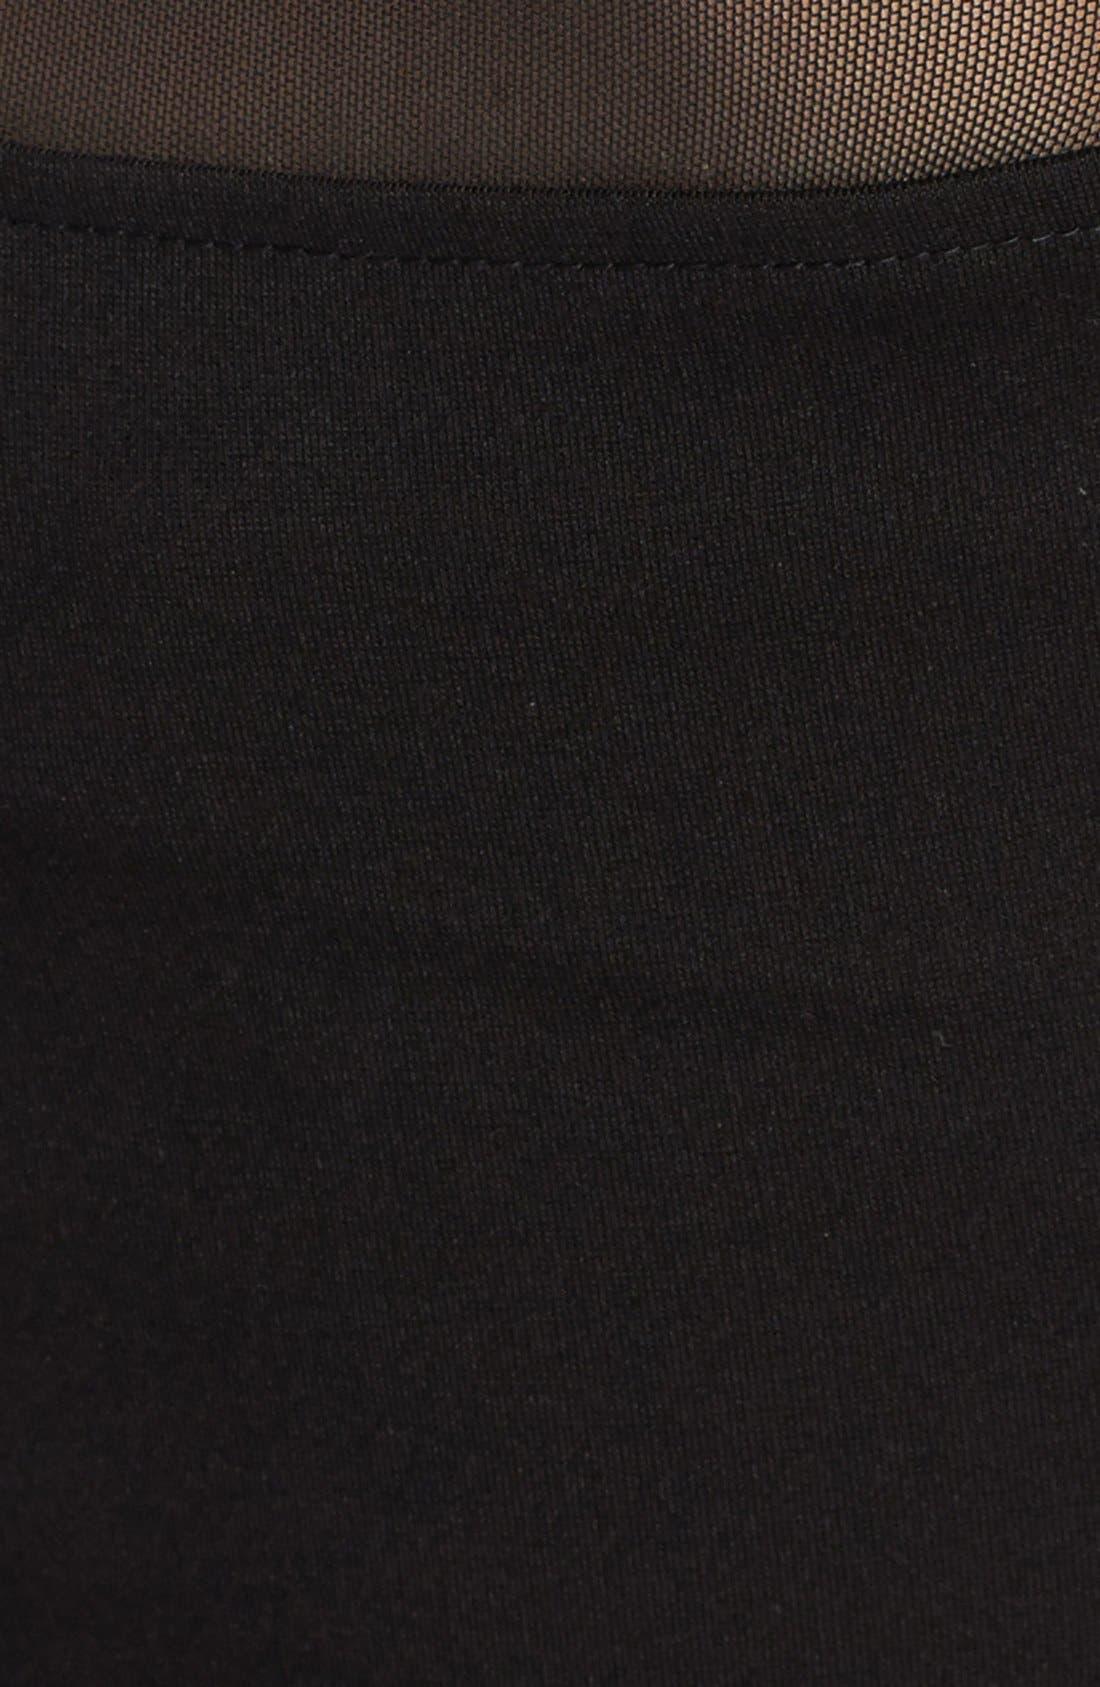 'Rhyannon' Sheer Yoke Ponte Sheath Dress,                             Alternate thumbnail 3, color,                             001